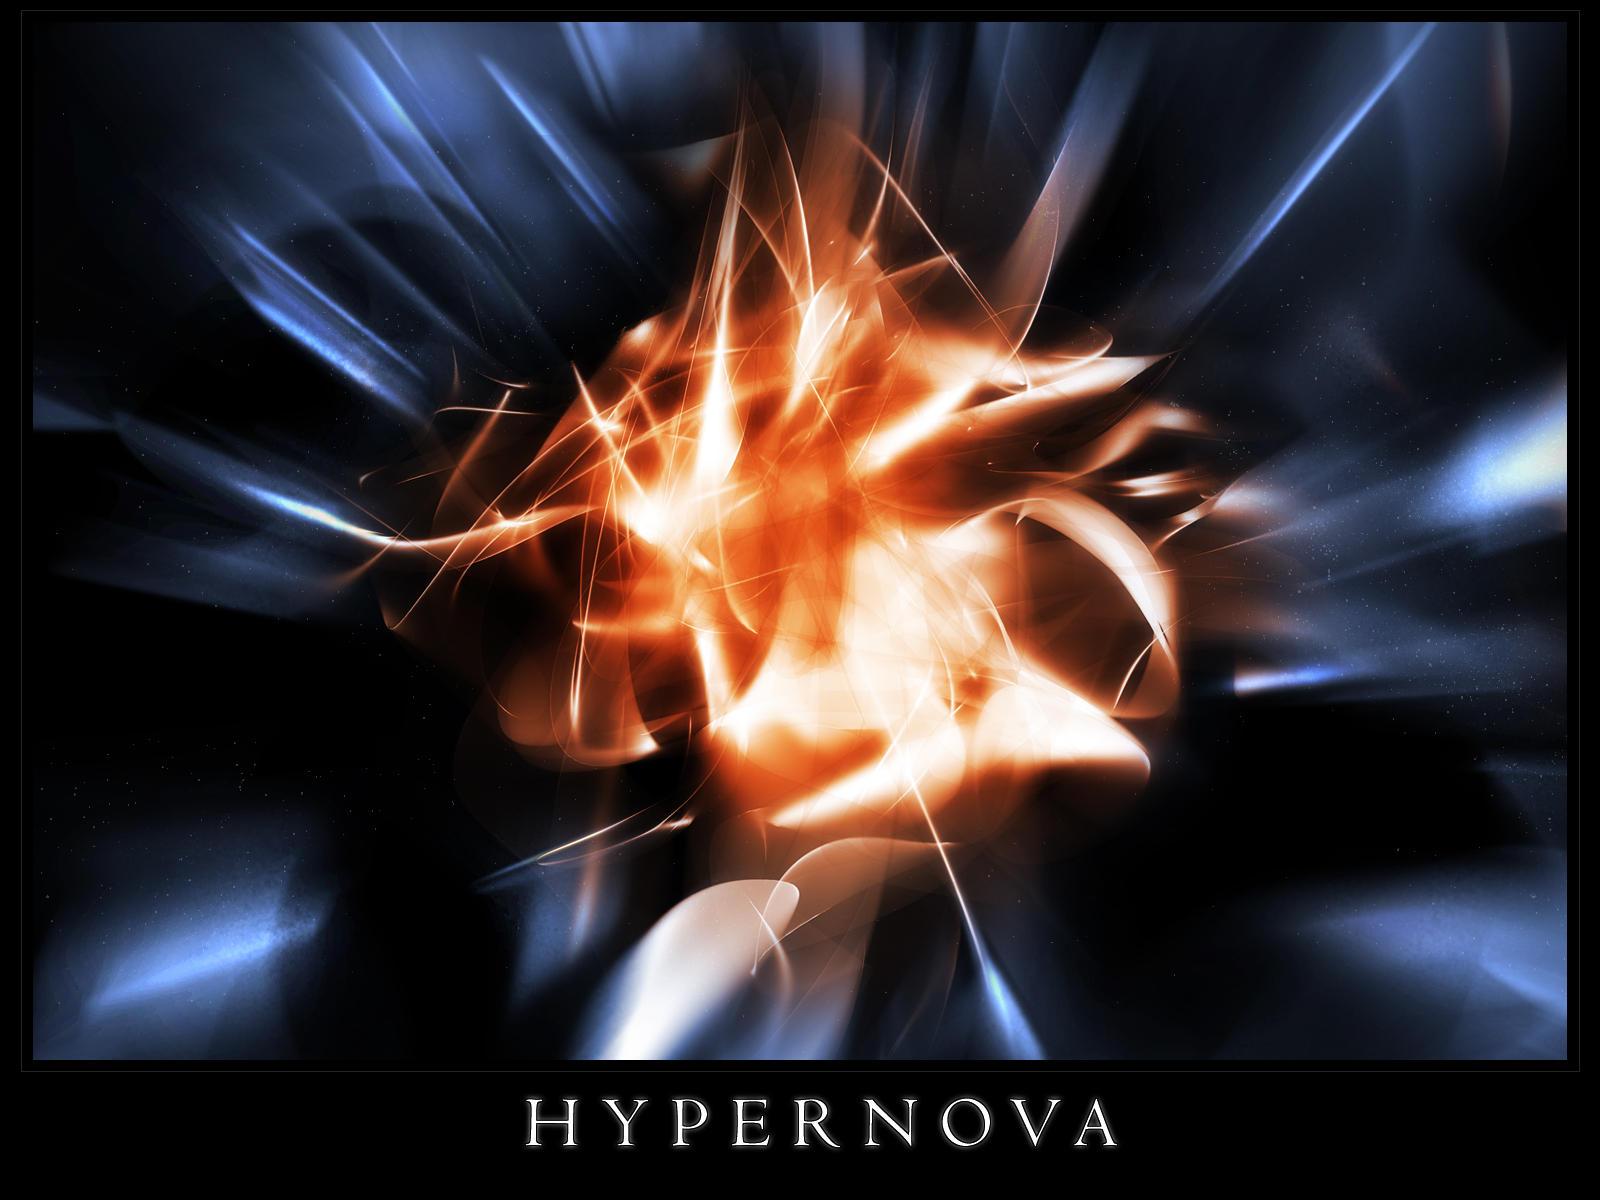 hypernova by helios on deviantart